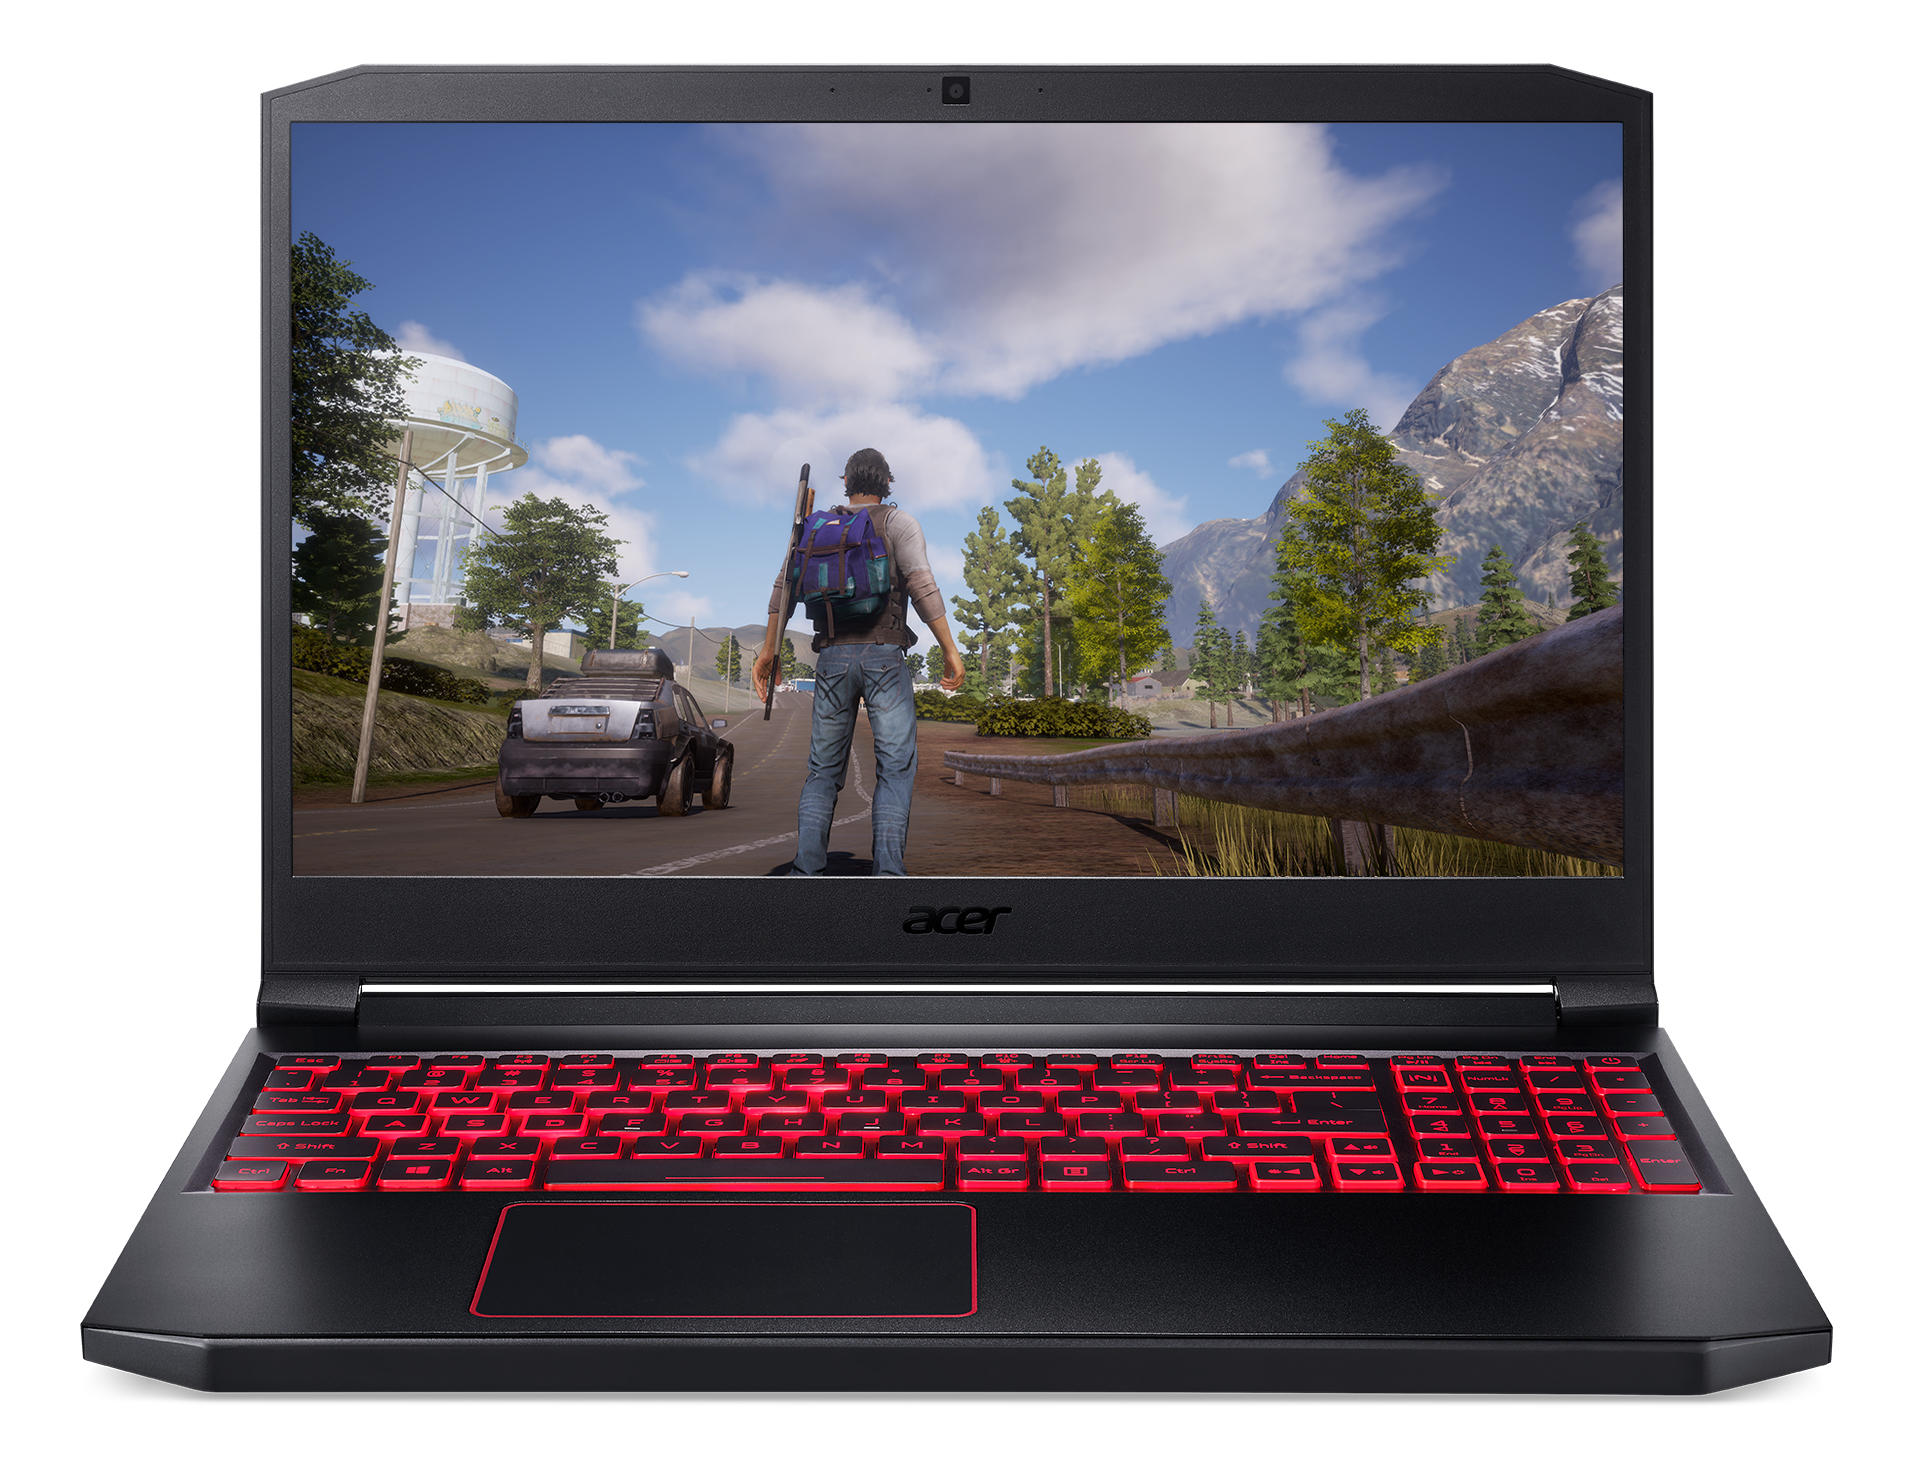 Acer Nitro 7 AN715-52-74T8 laptop